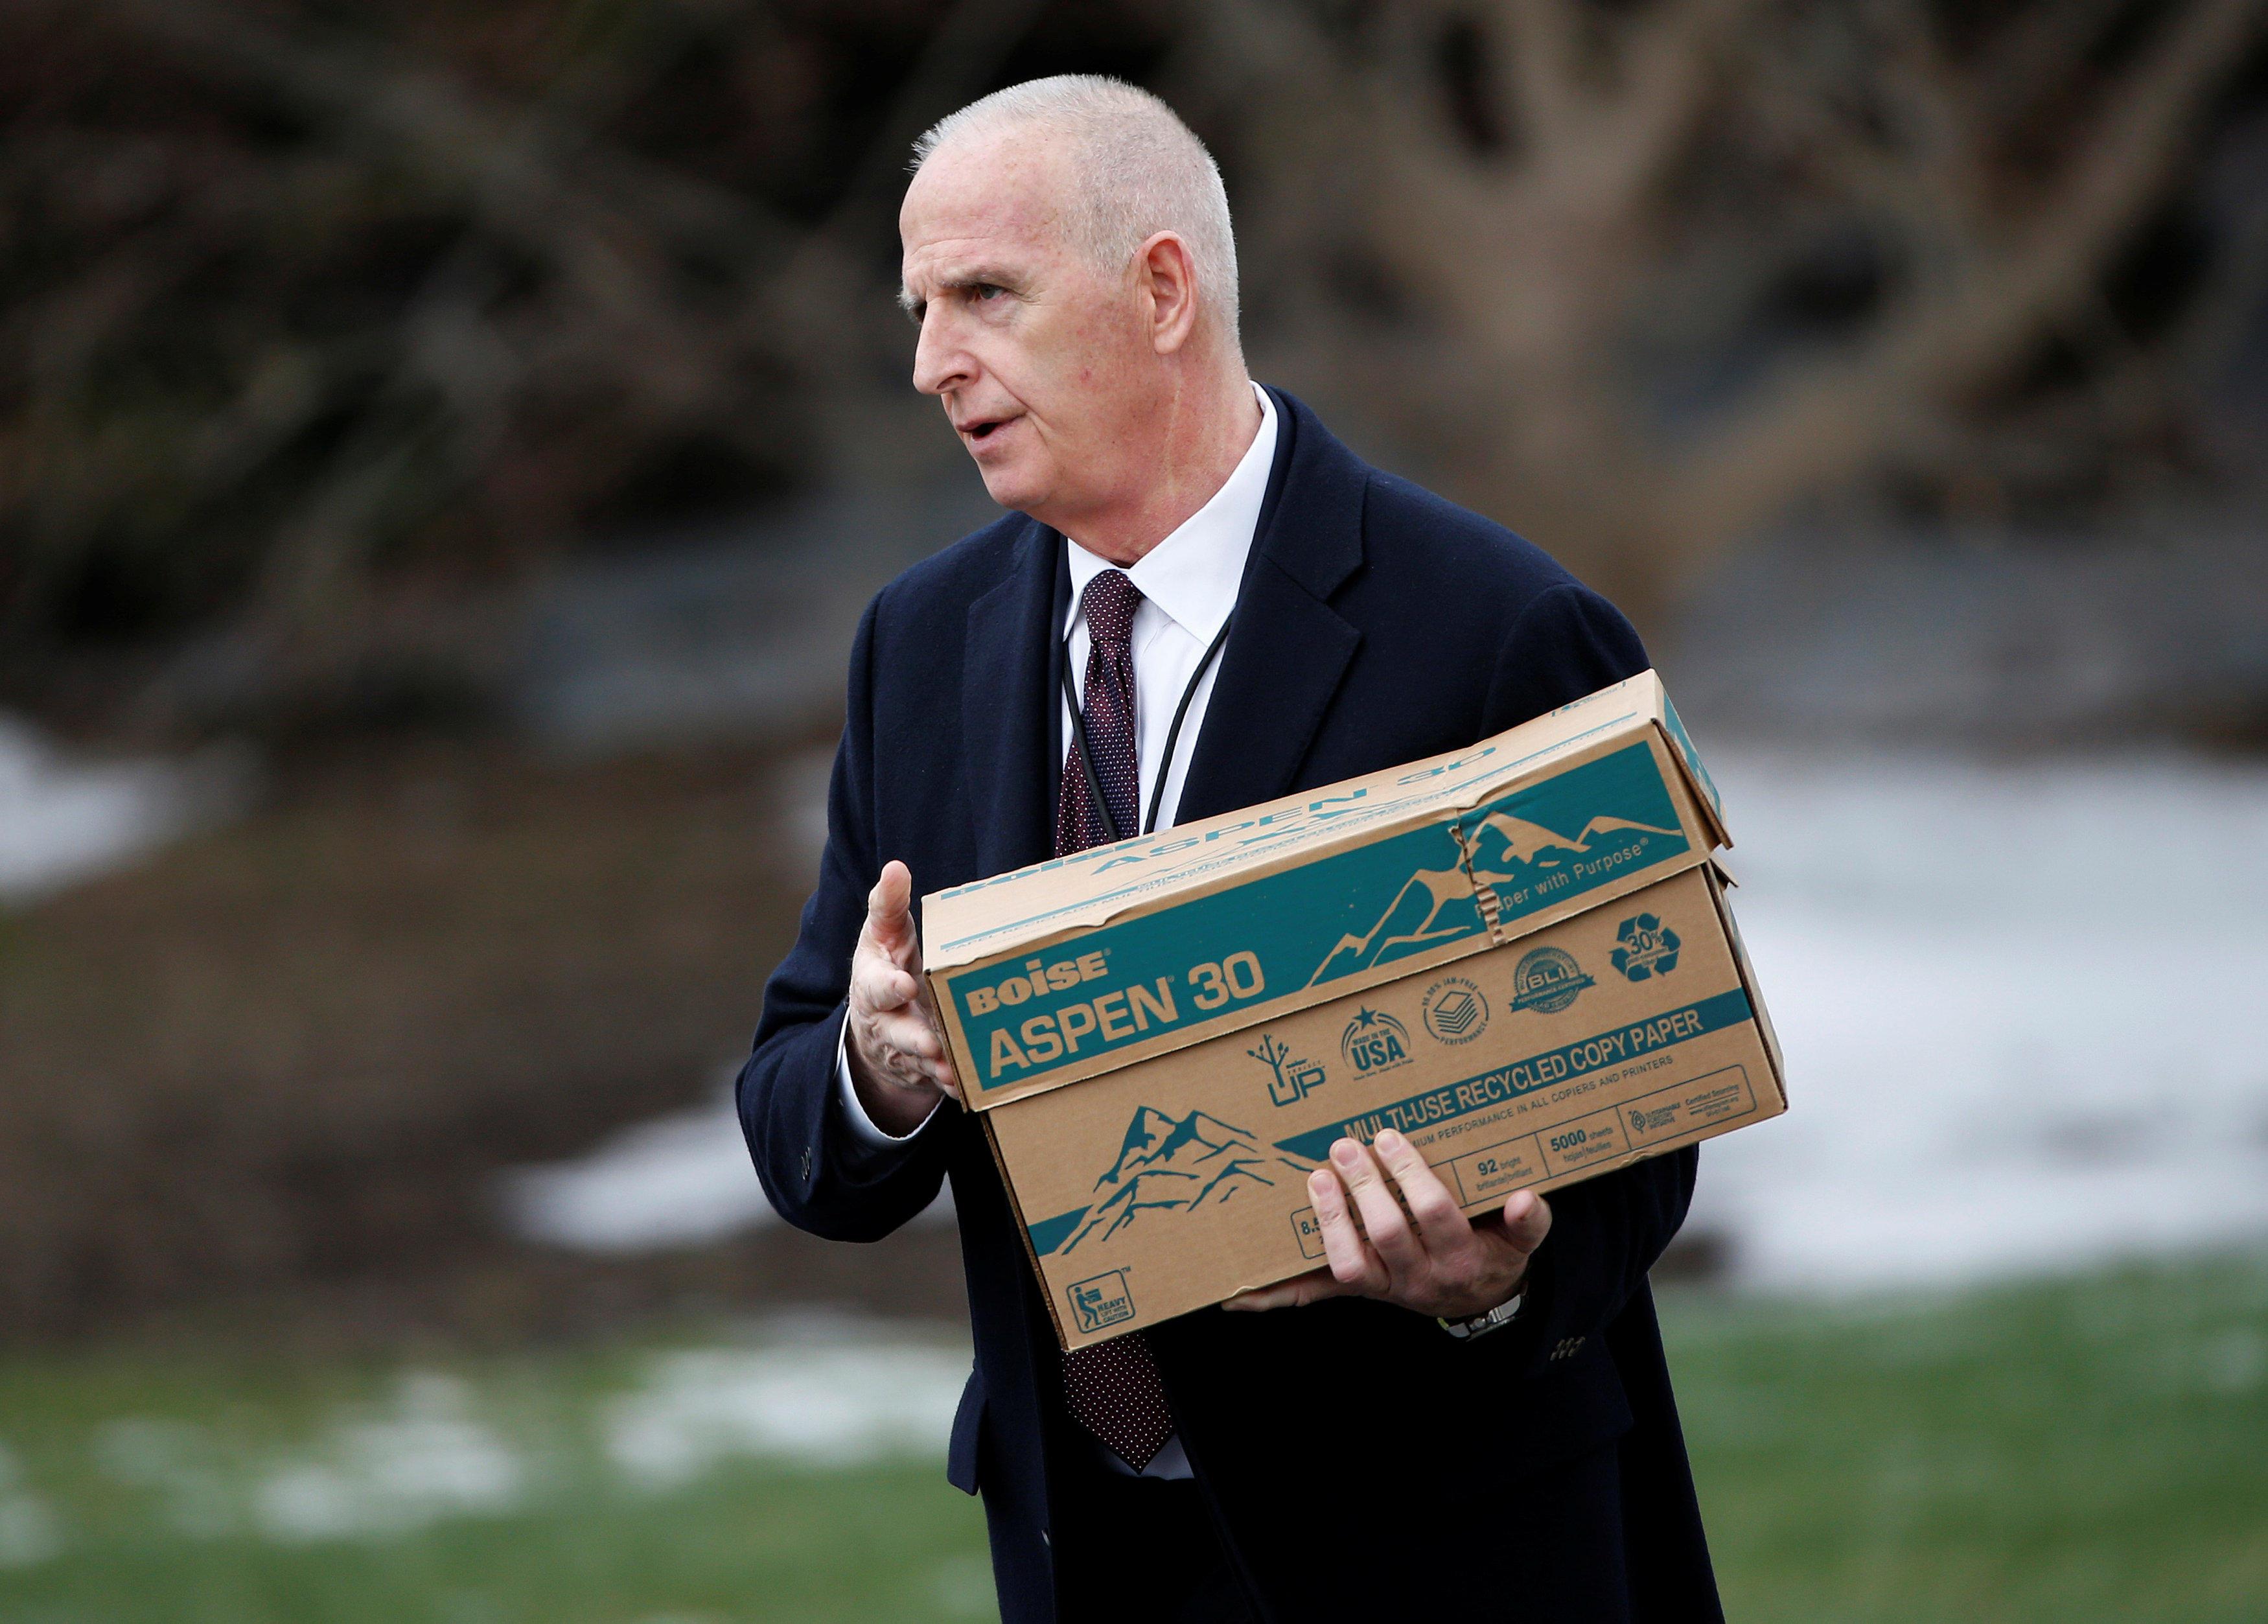 Former Bodyguard Keith Schiller Maintains Role As Top Trump